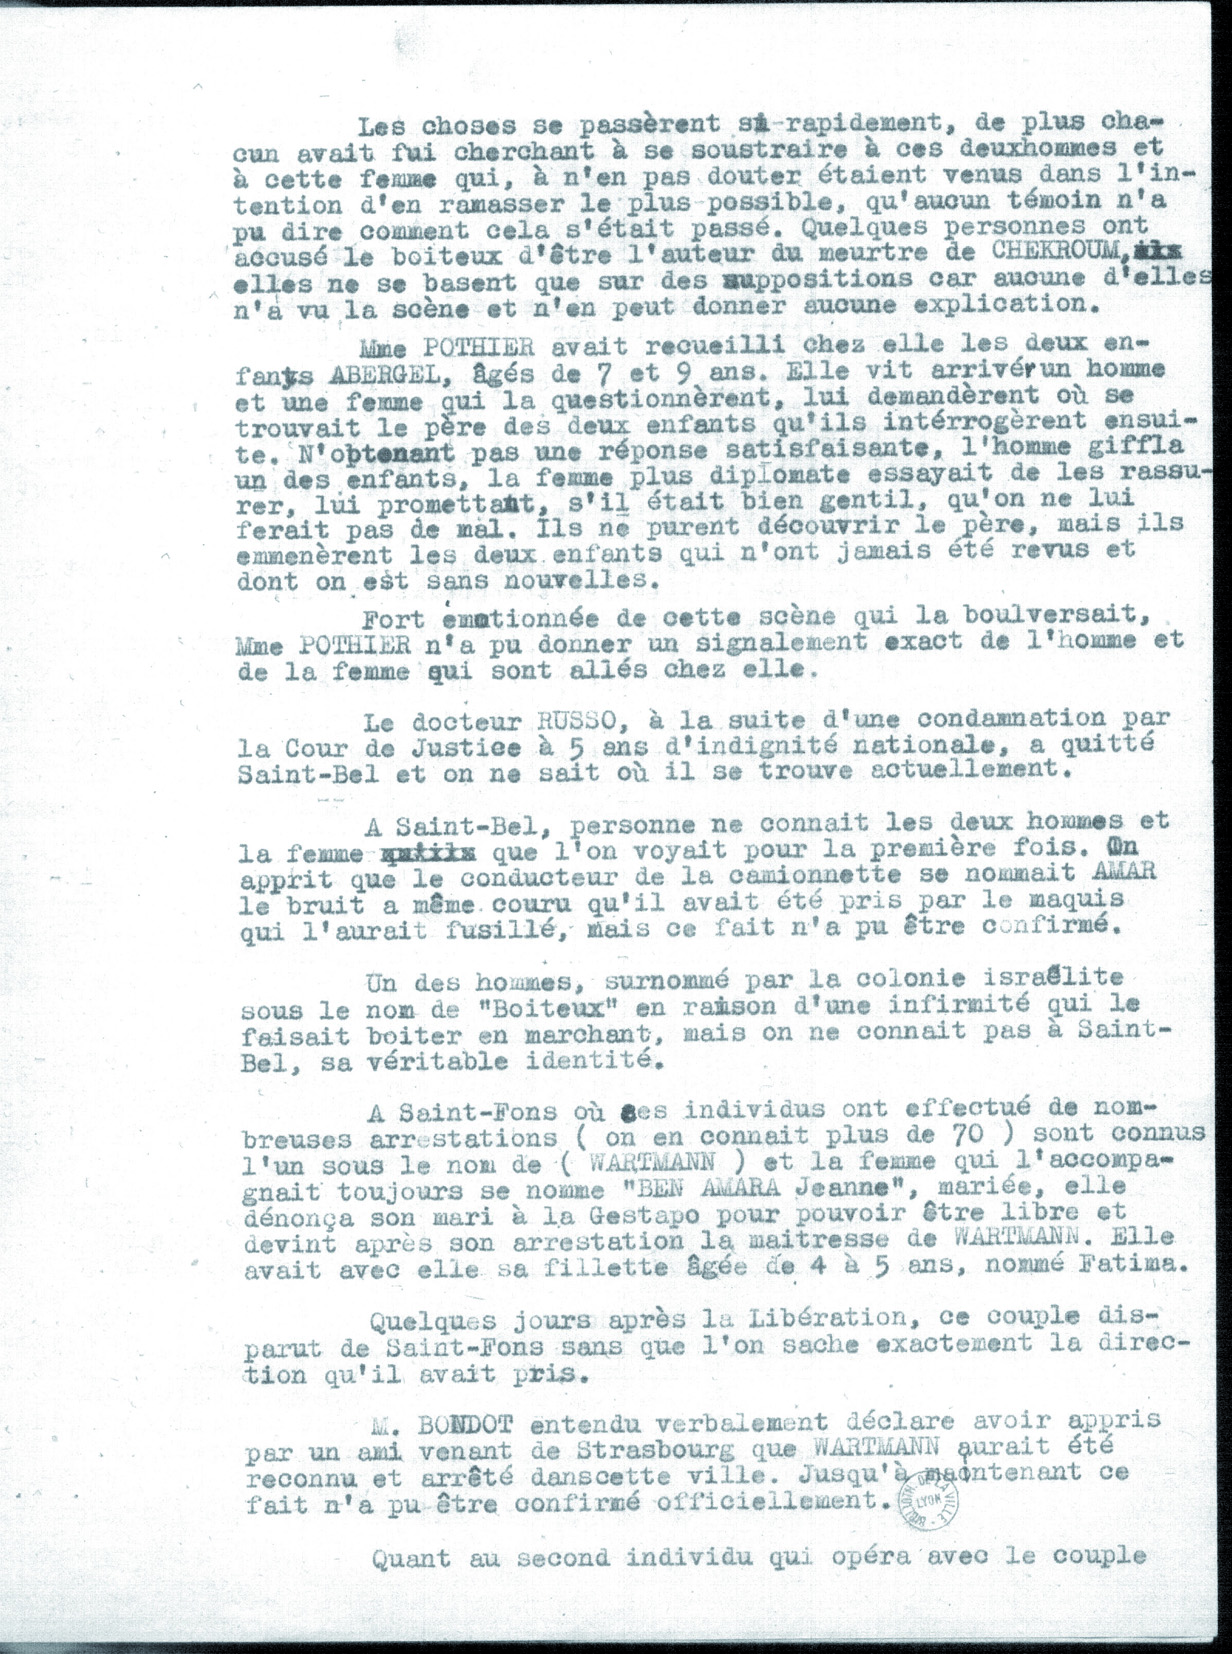 ABERGEL3808W1087-6-012 (Document officiel)